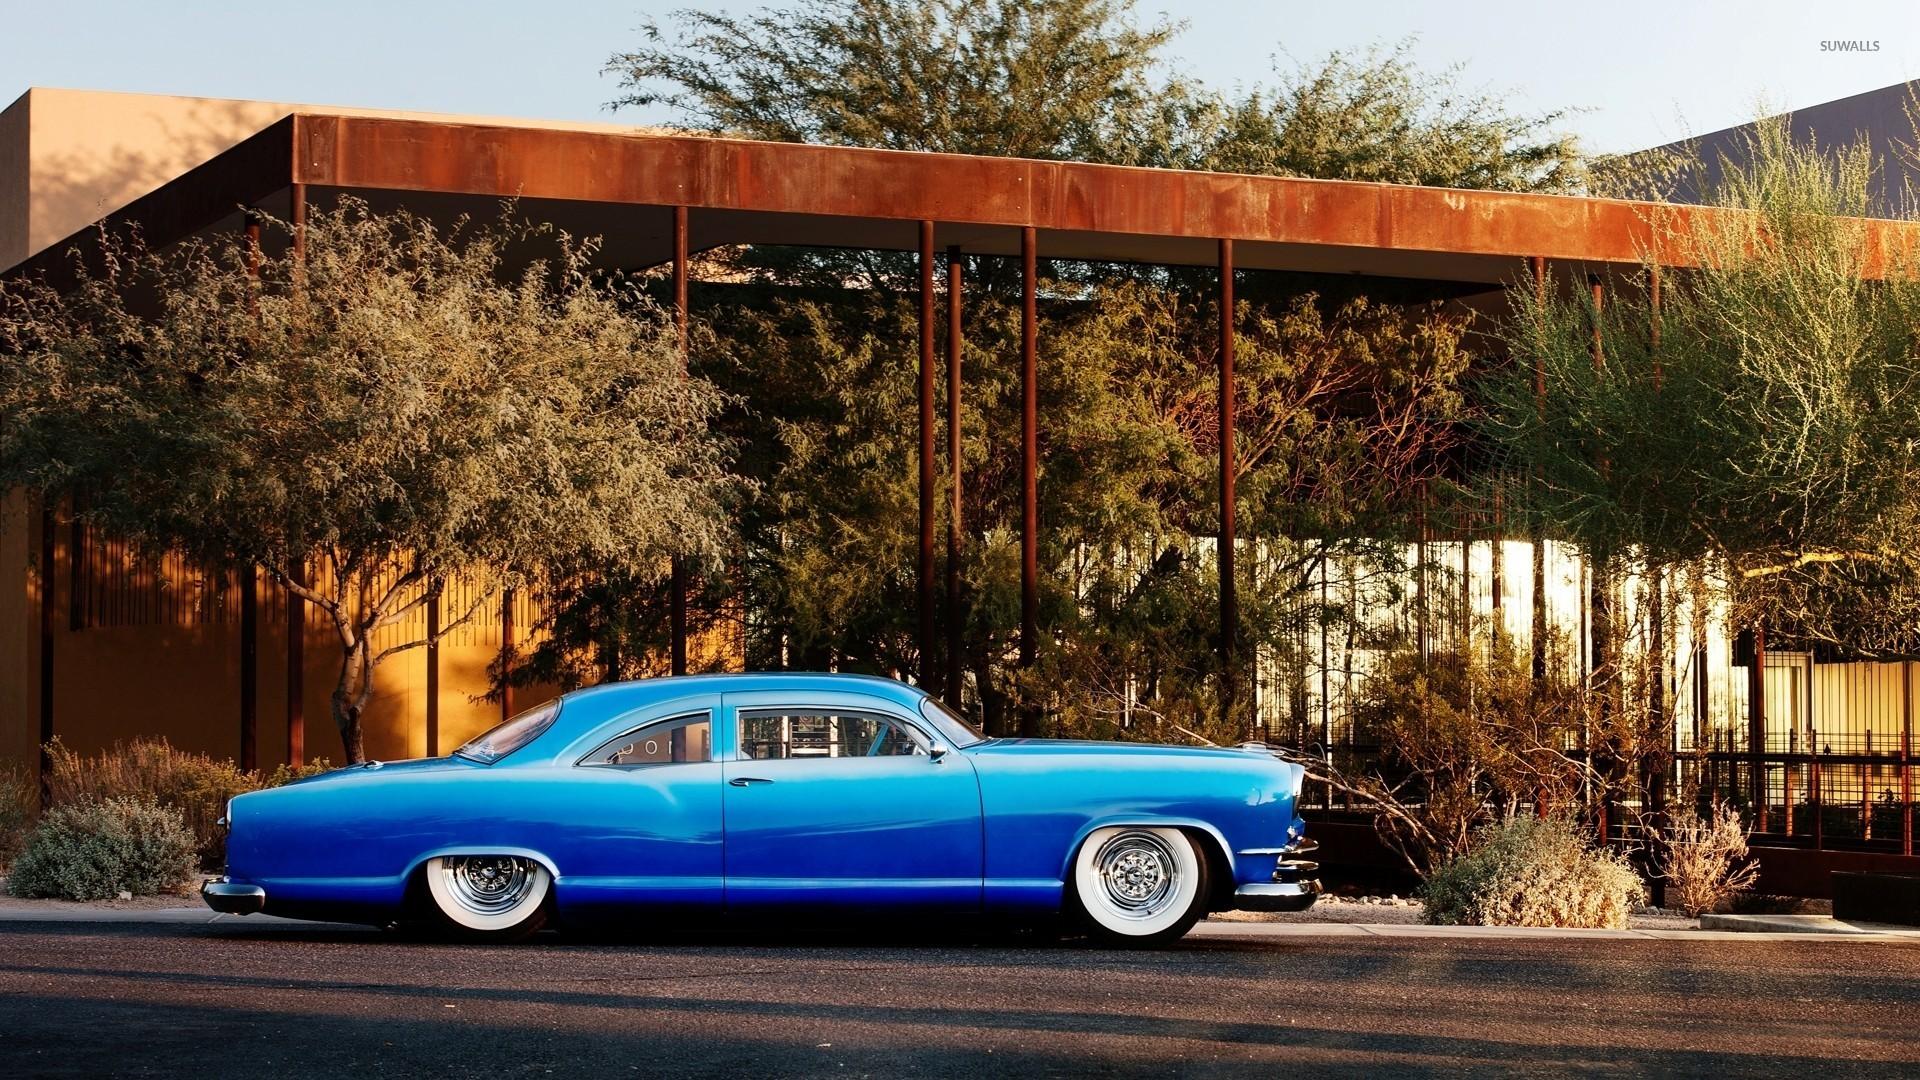 Blue Vintage Car Wallpaper Car Wallpapers 44906